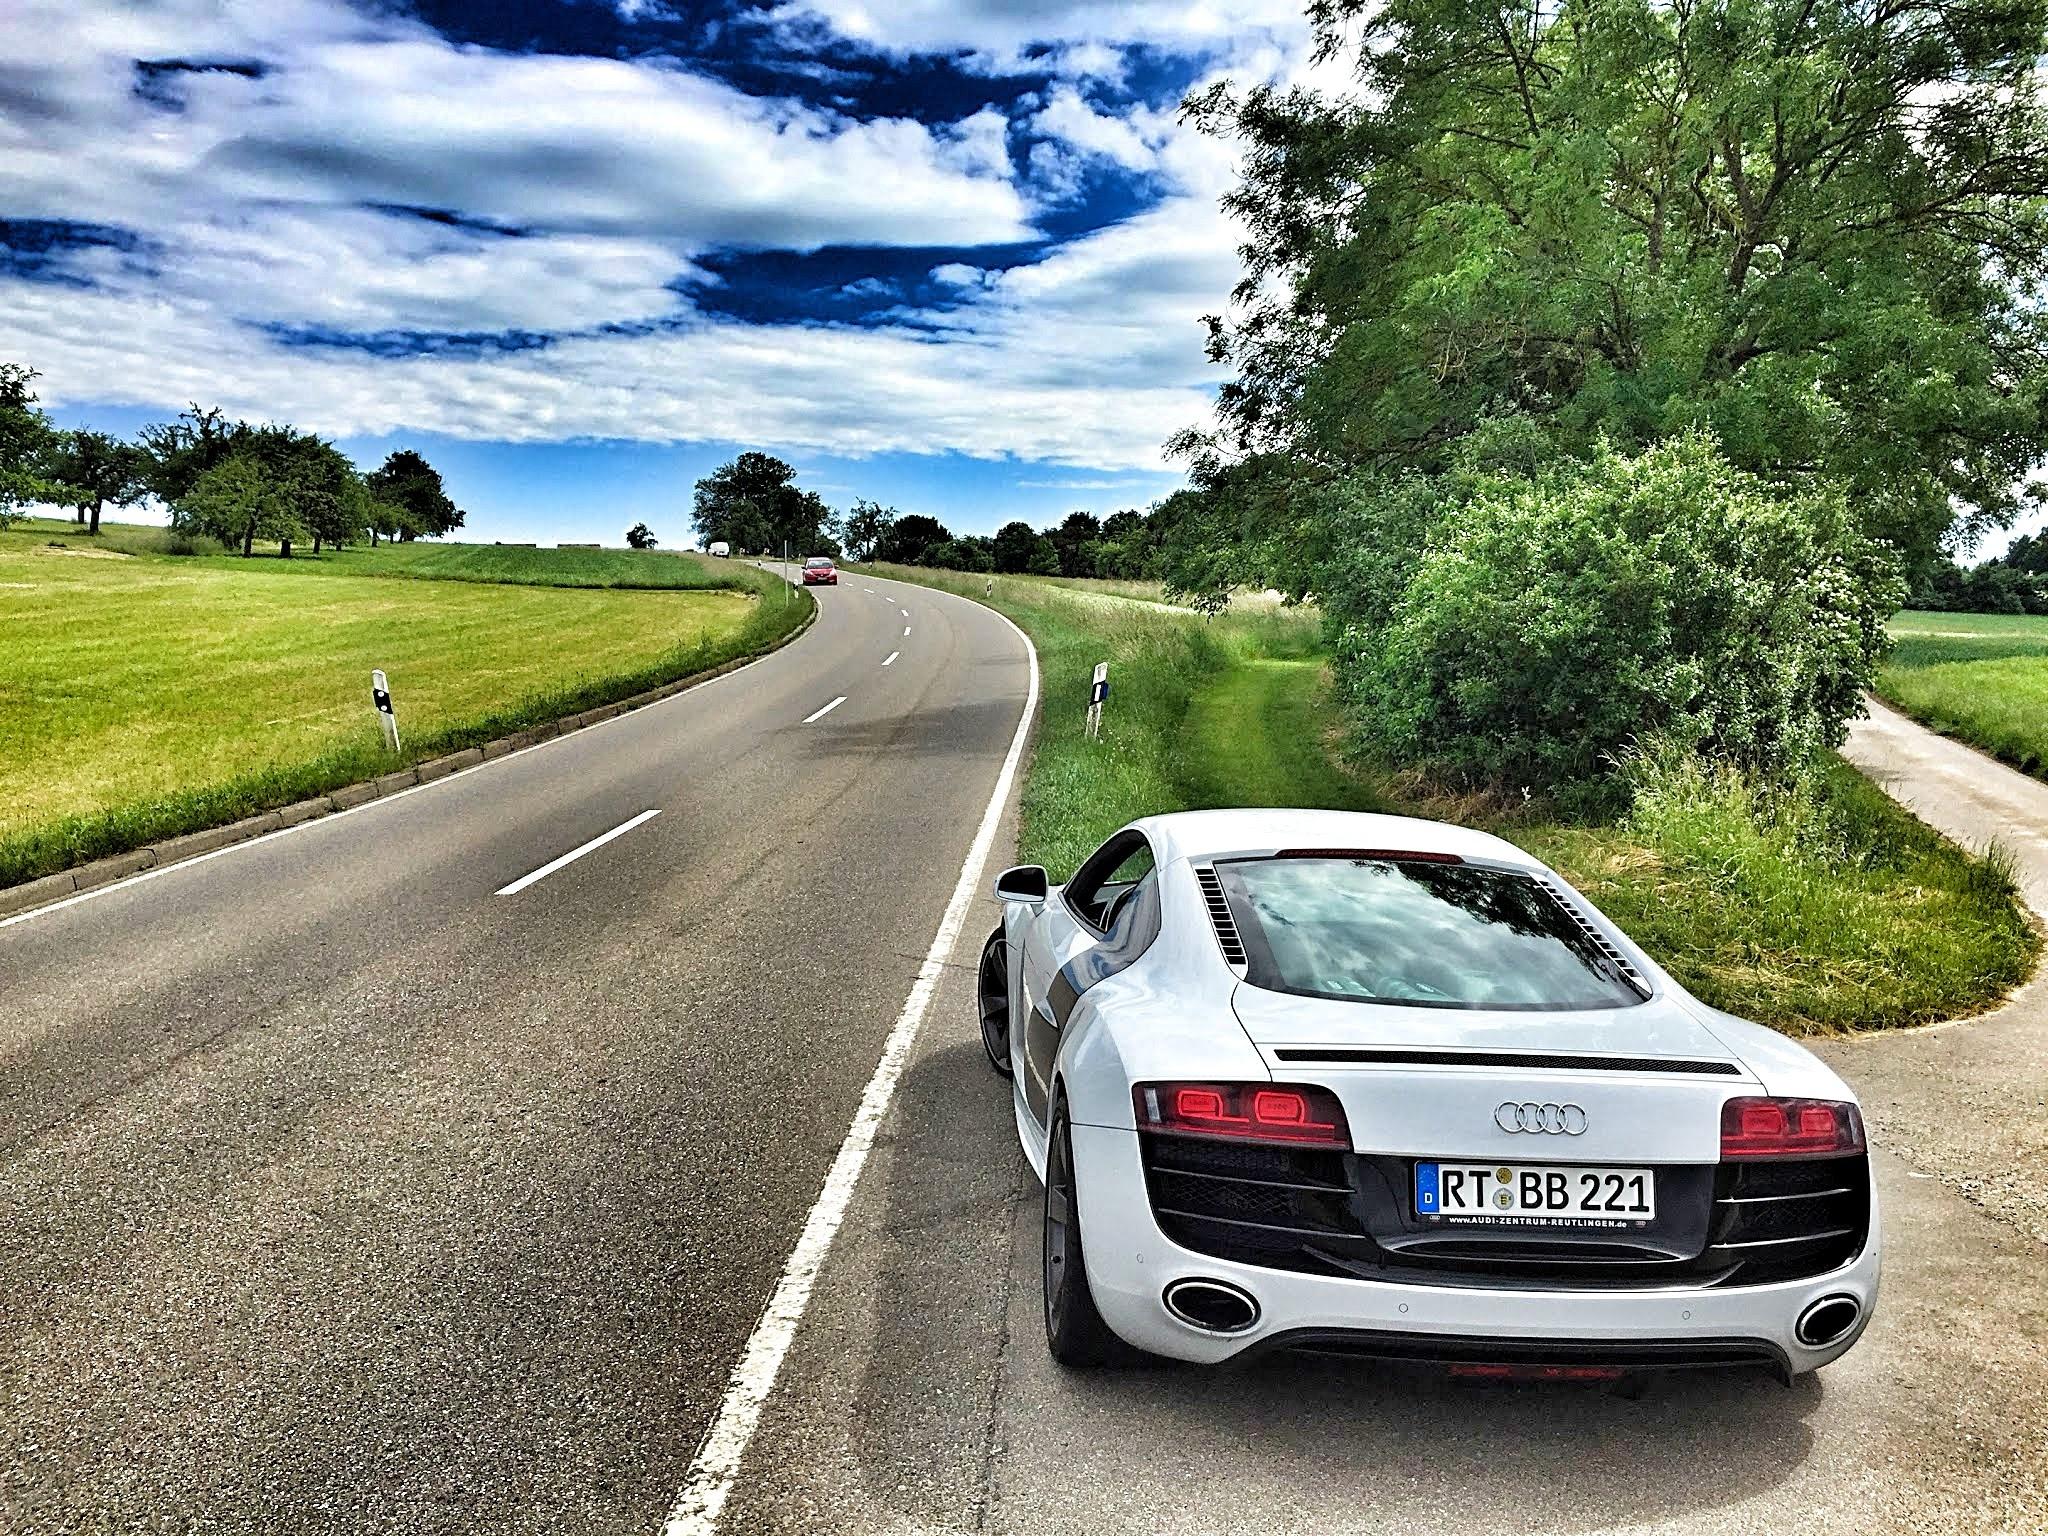 Pixabay - Europe Car , HD Wallpaper & Backgrounds